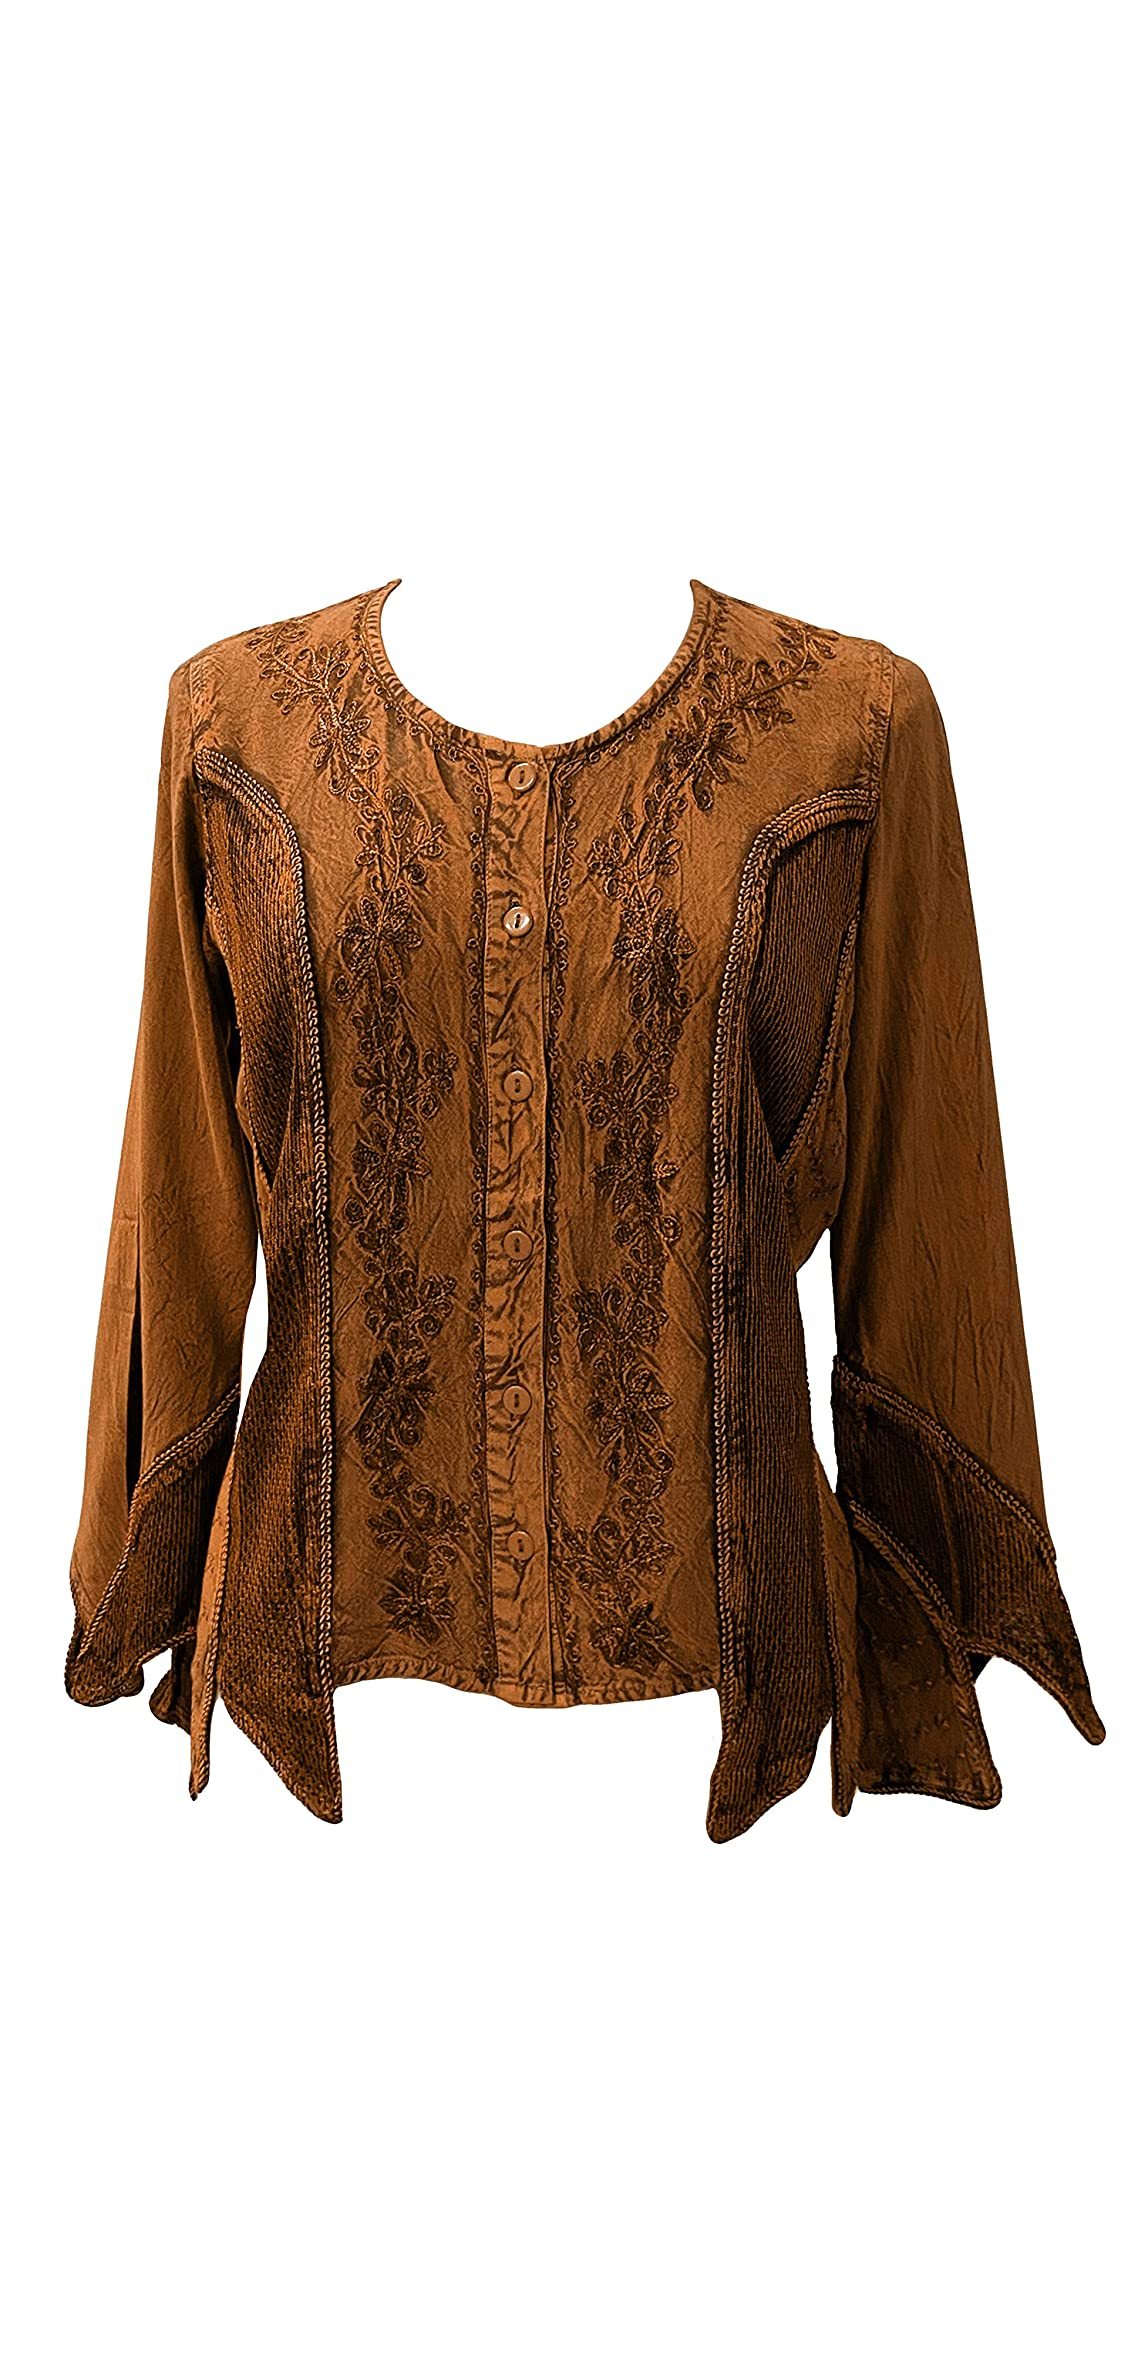 Women's Gypsy Bohemian Button Down Long Sleeve Top